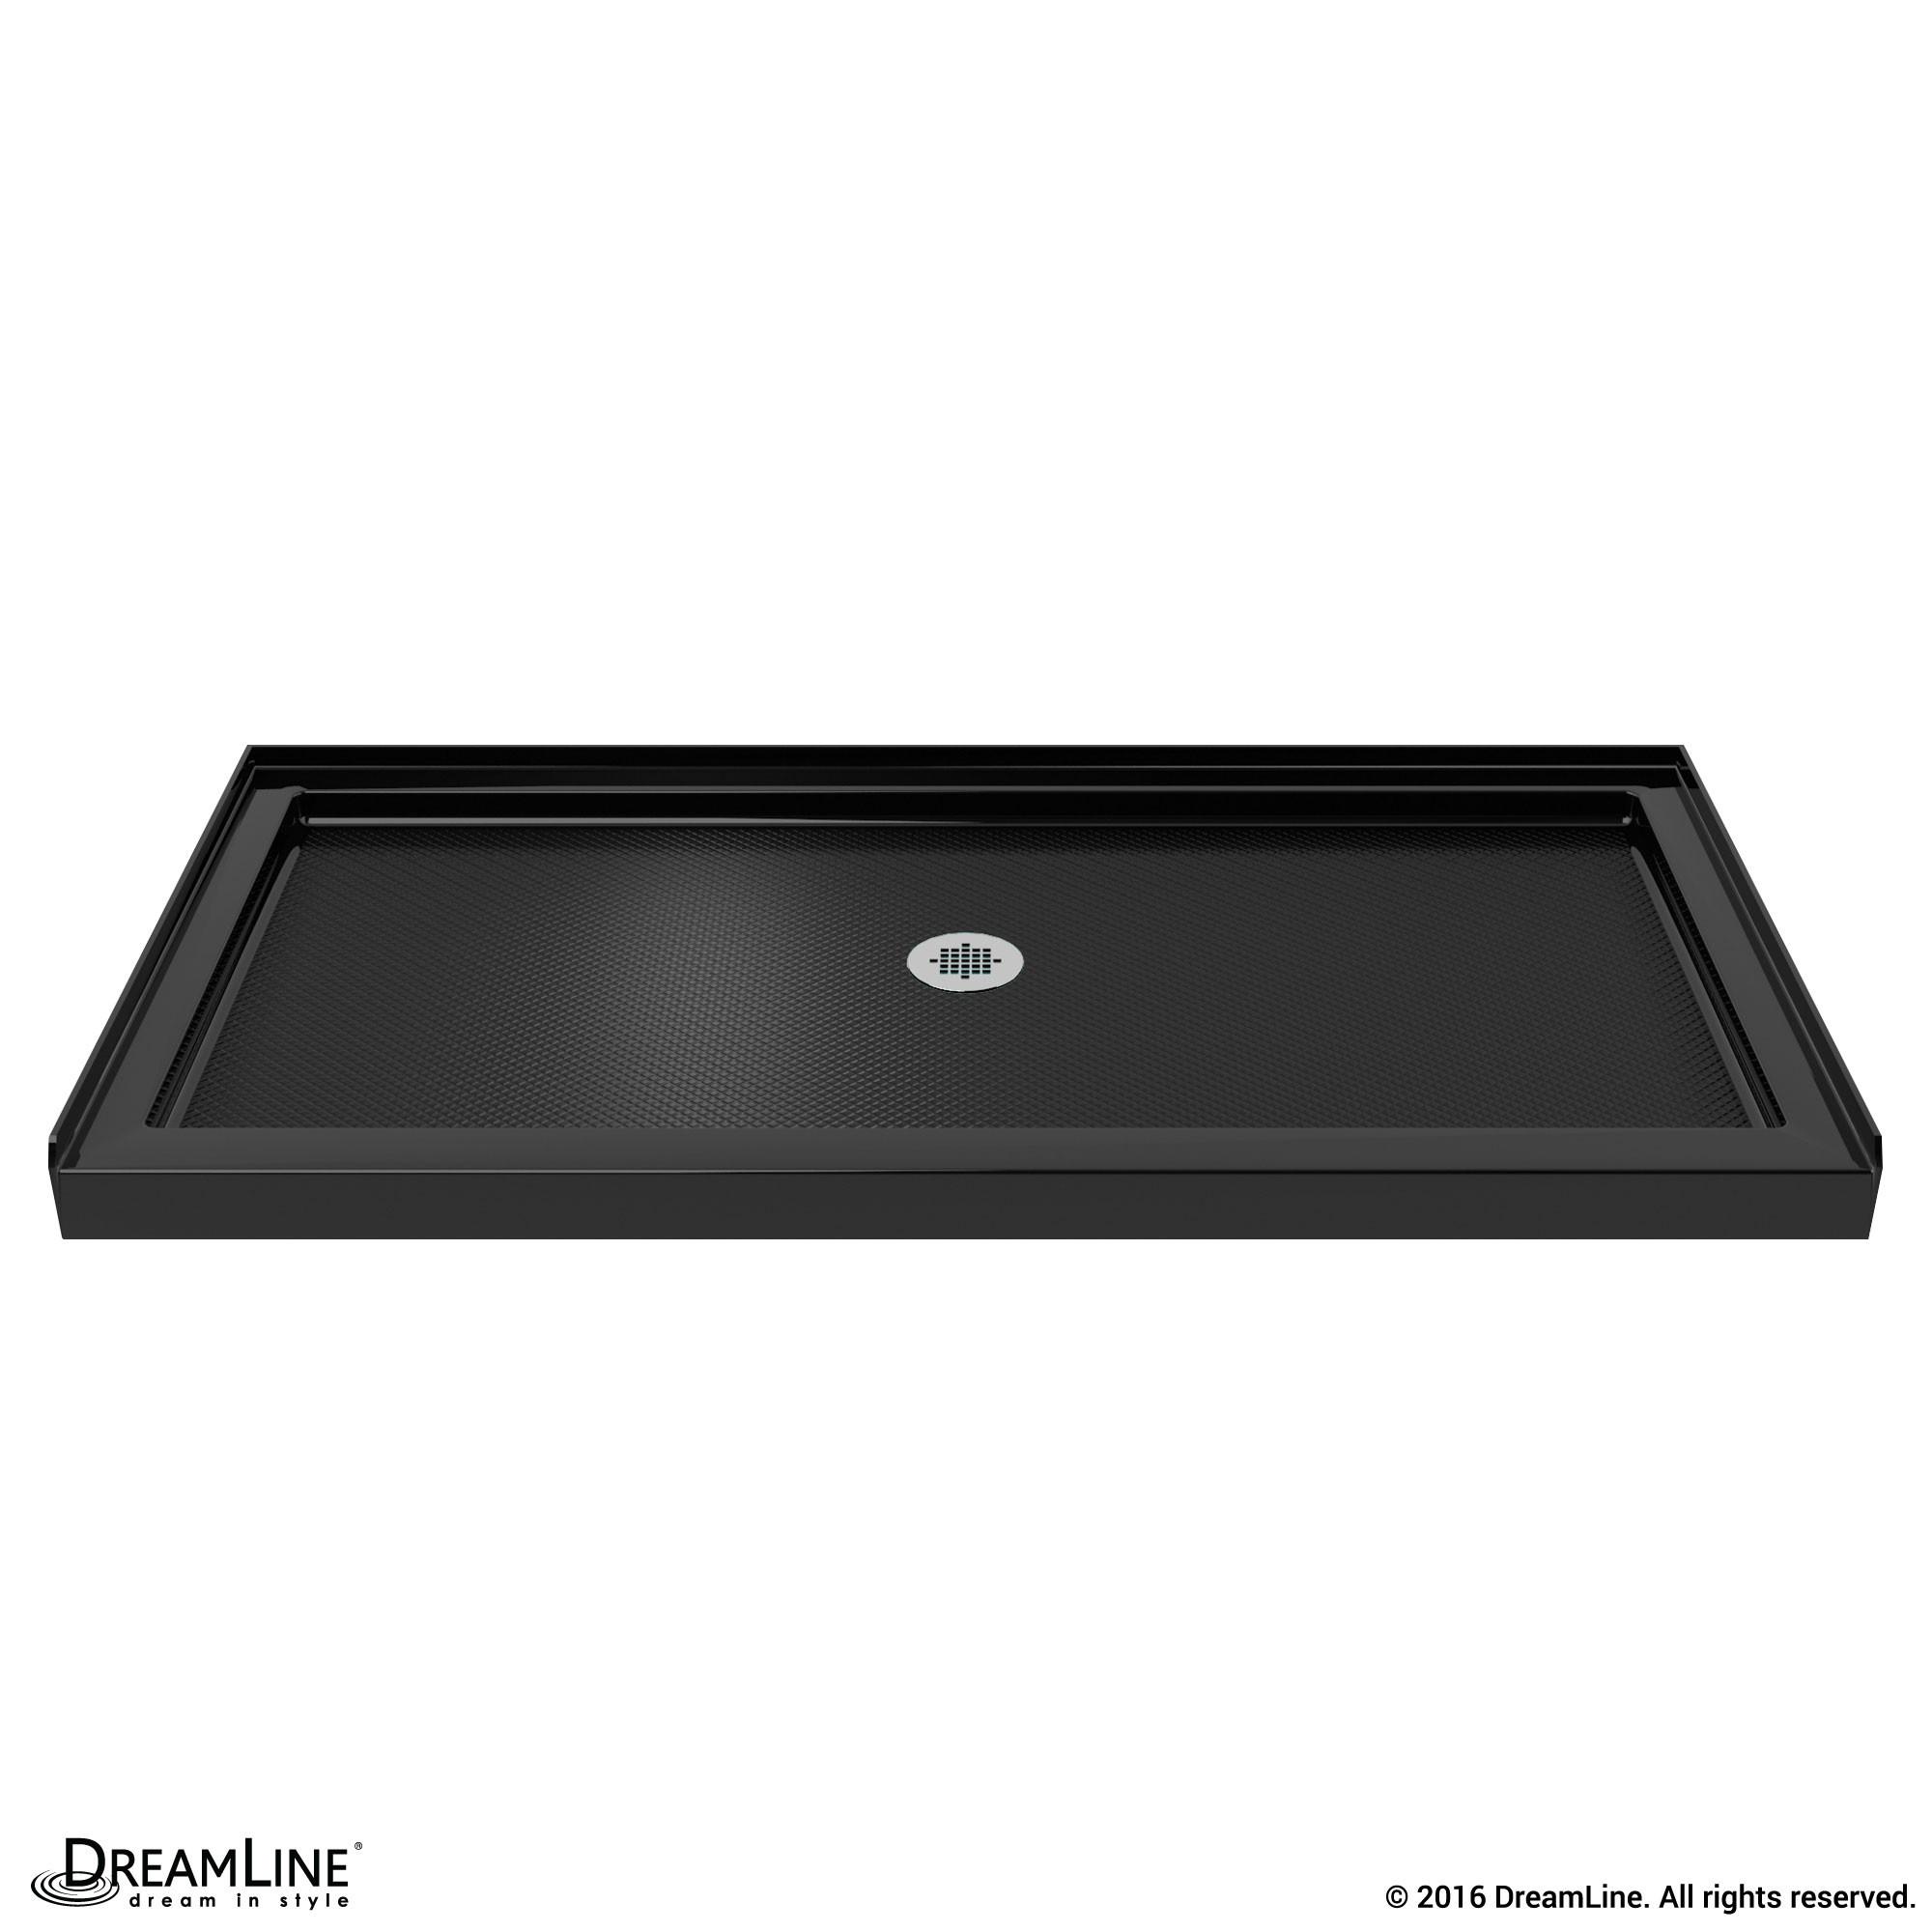 DreamLine DLT-1136600-88 SlimLine 36 Inch by 60 Inch Single Threshold Shower Base In Black Color Center Drain